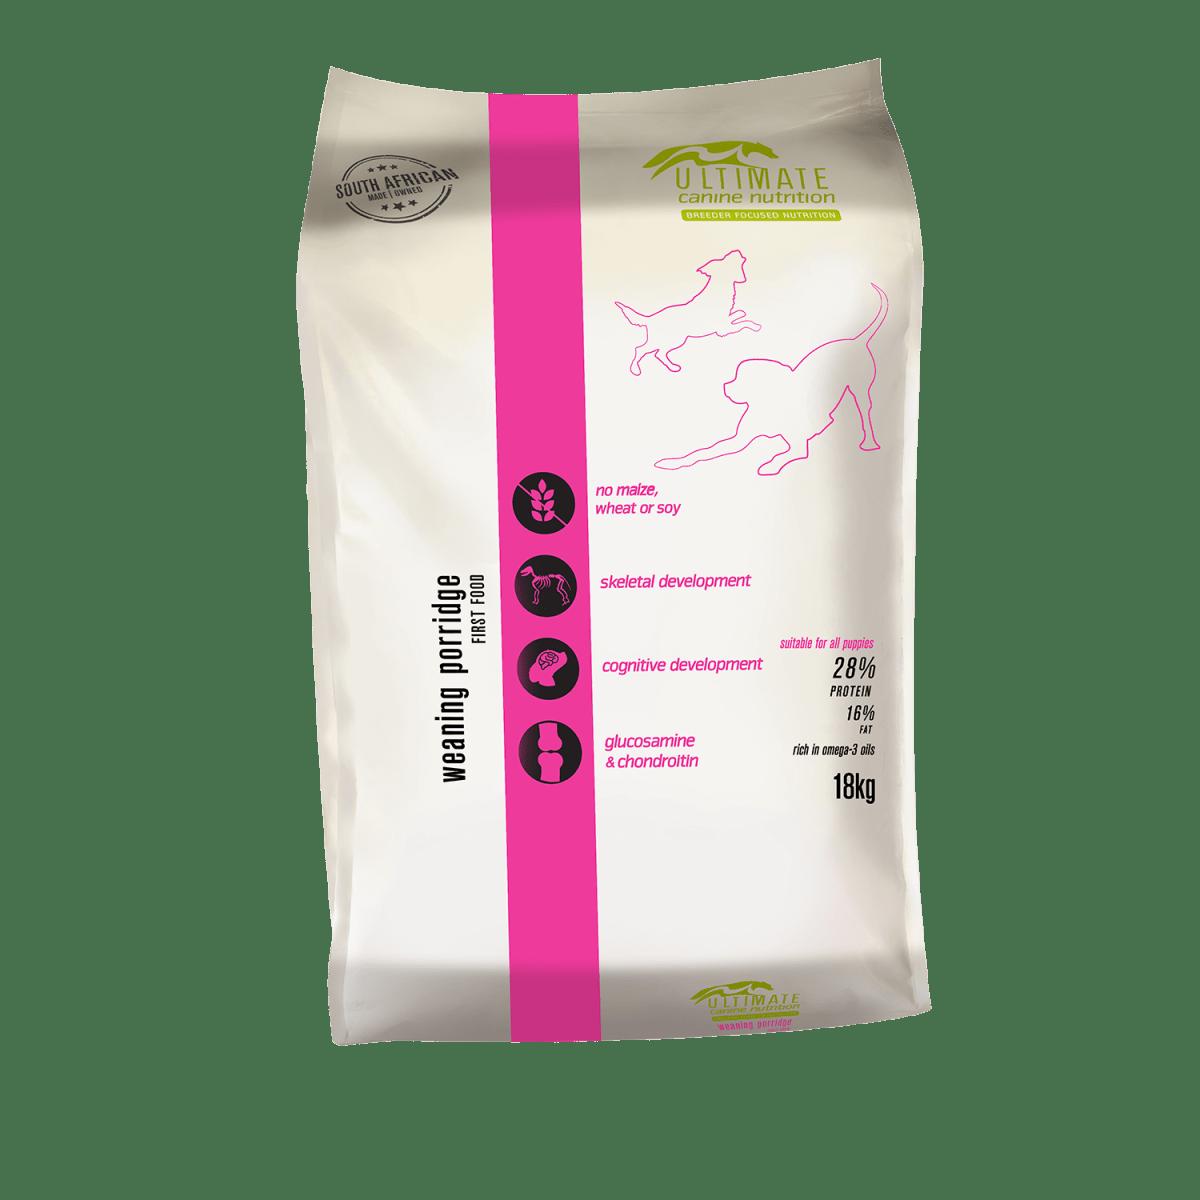 pack shot_Weaning pink_1500_transparent